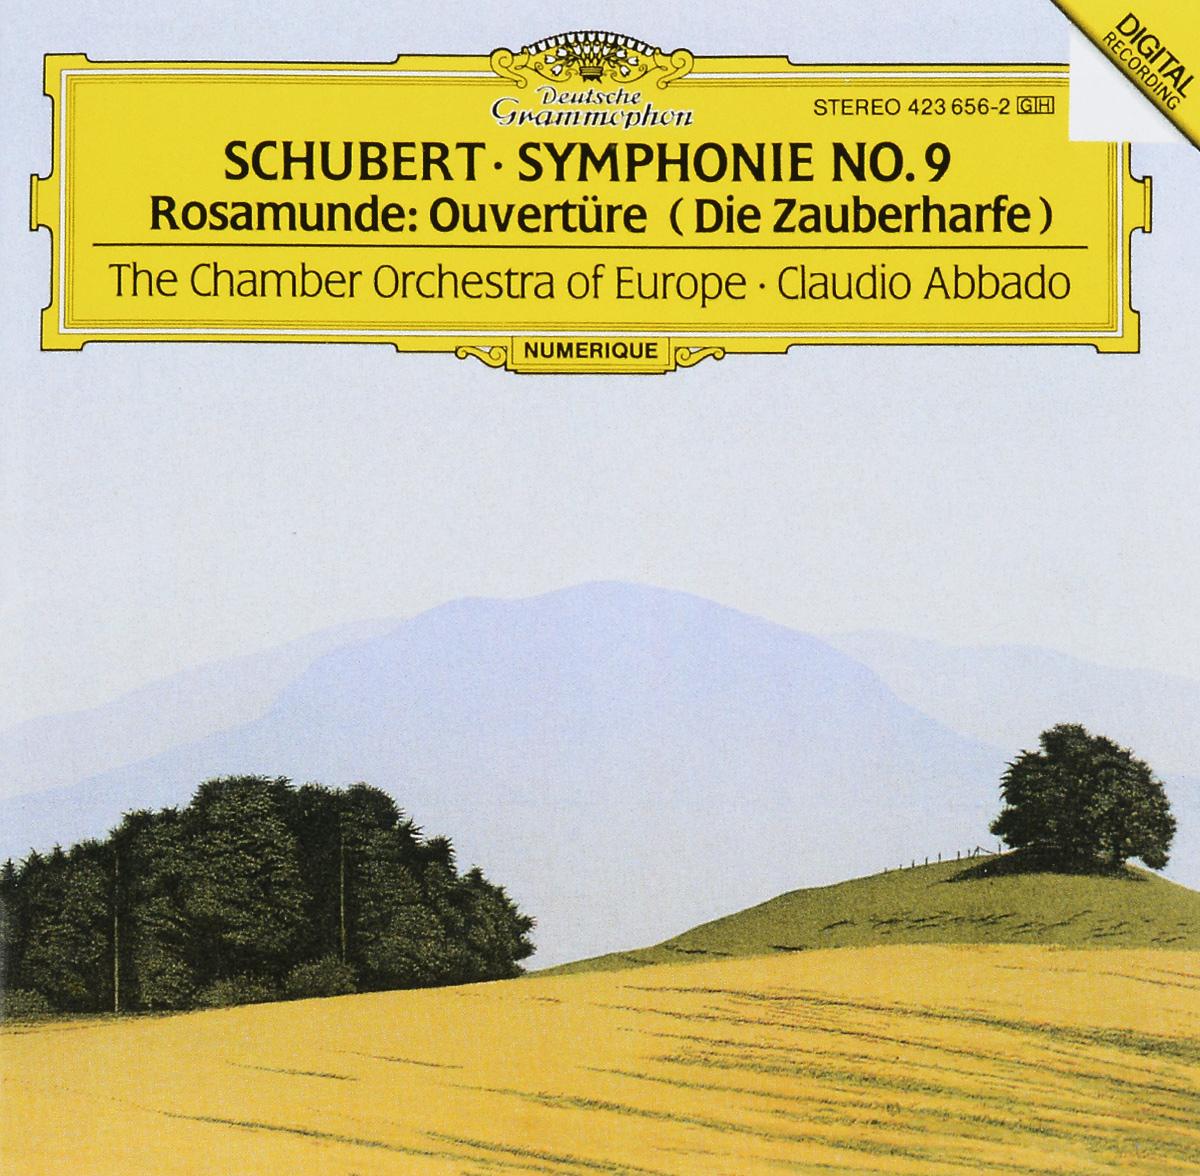 Франц Шуберт SCHUBERT. SYMPHONIE NO. 9. Rosamunde: Ouverture (Die Zauberharfe) münchner philharmoniker elbphilharmonie hamburg